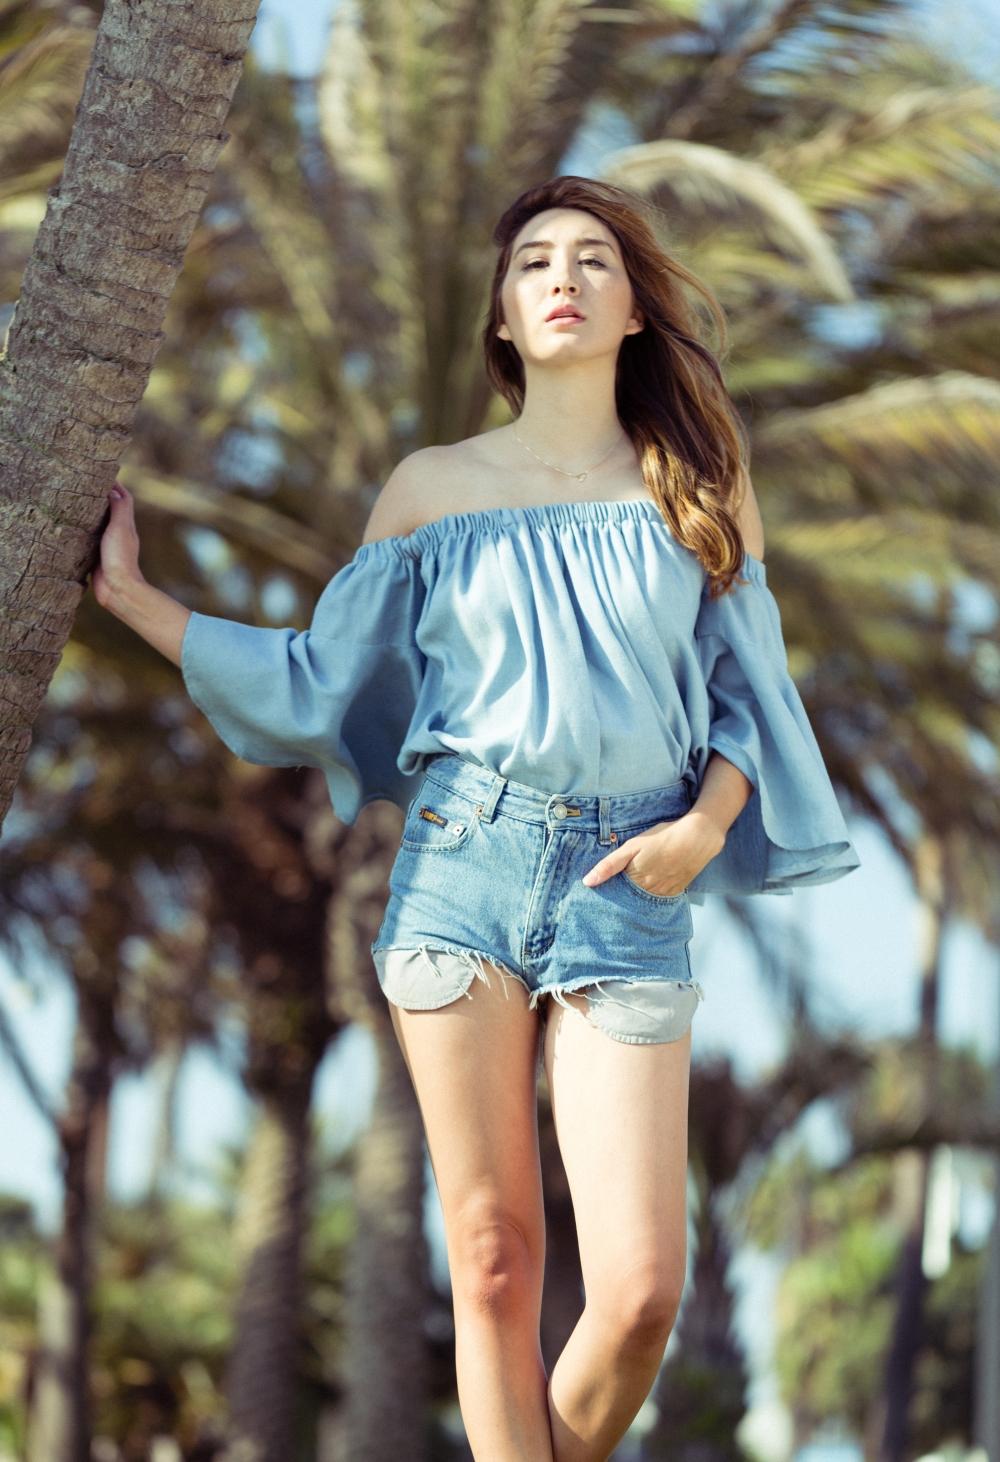 Alyssa Nicole Santa Monica Beach 2